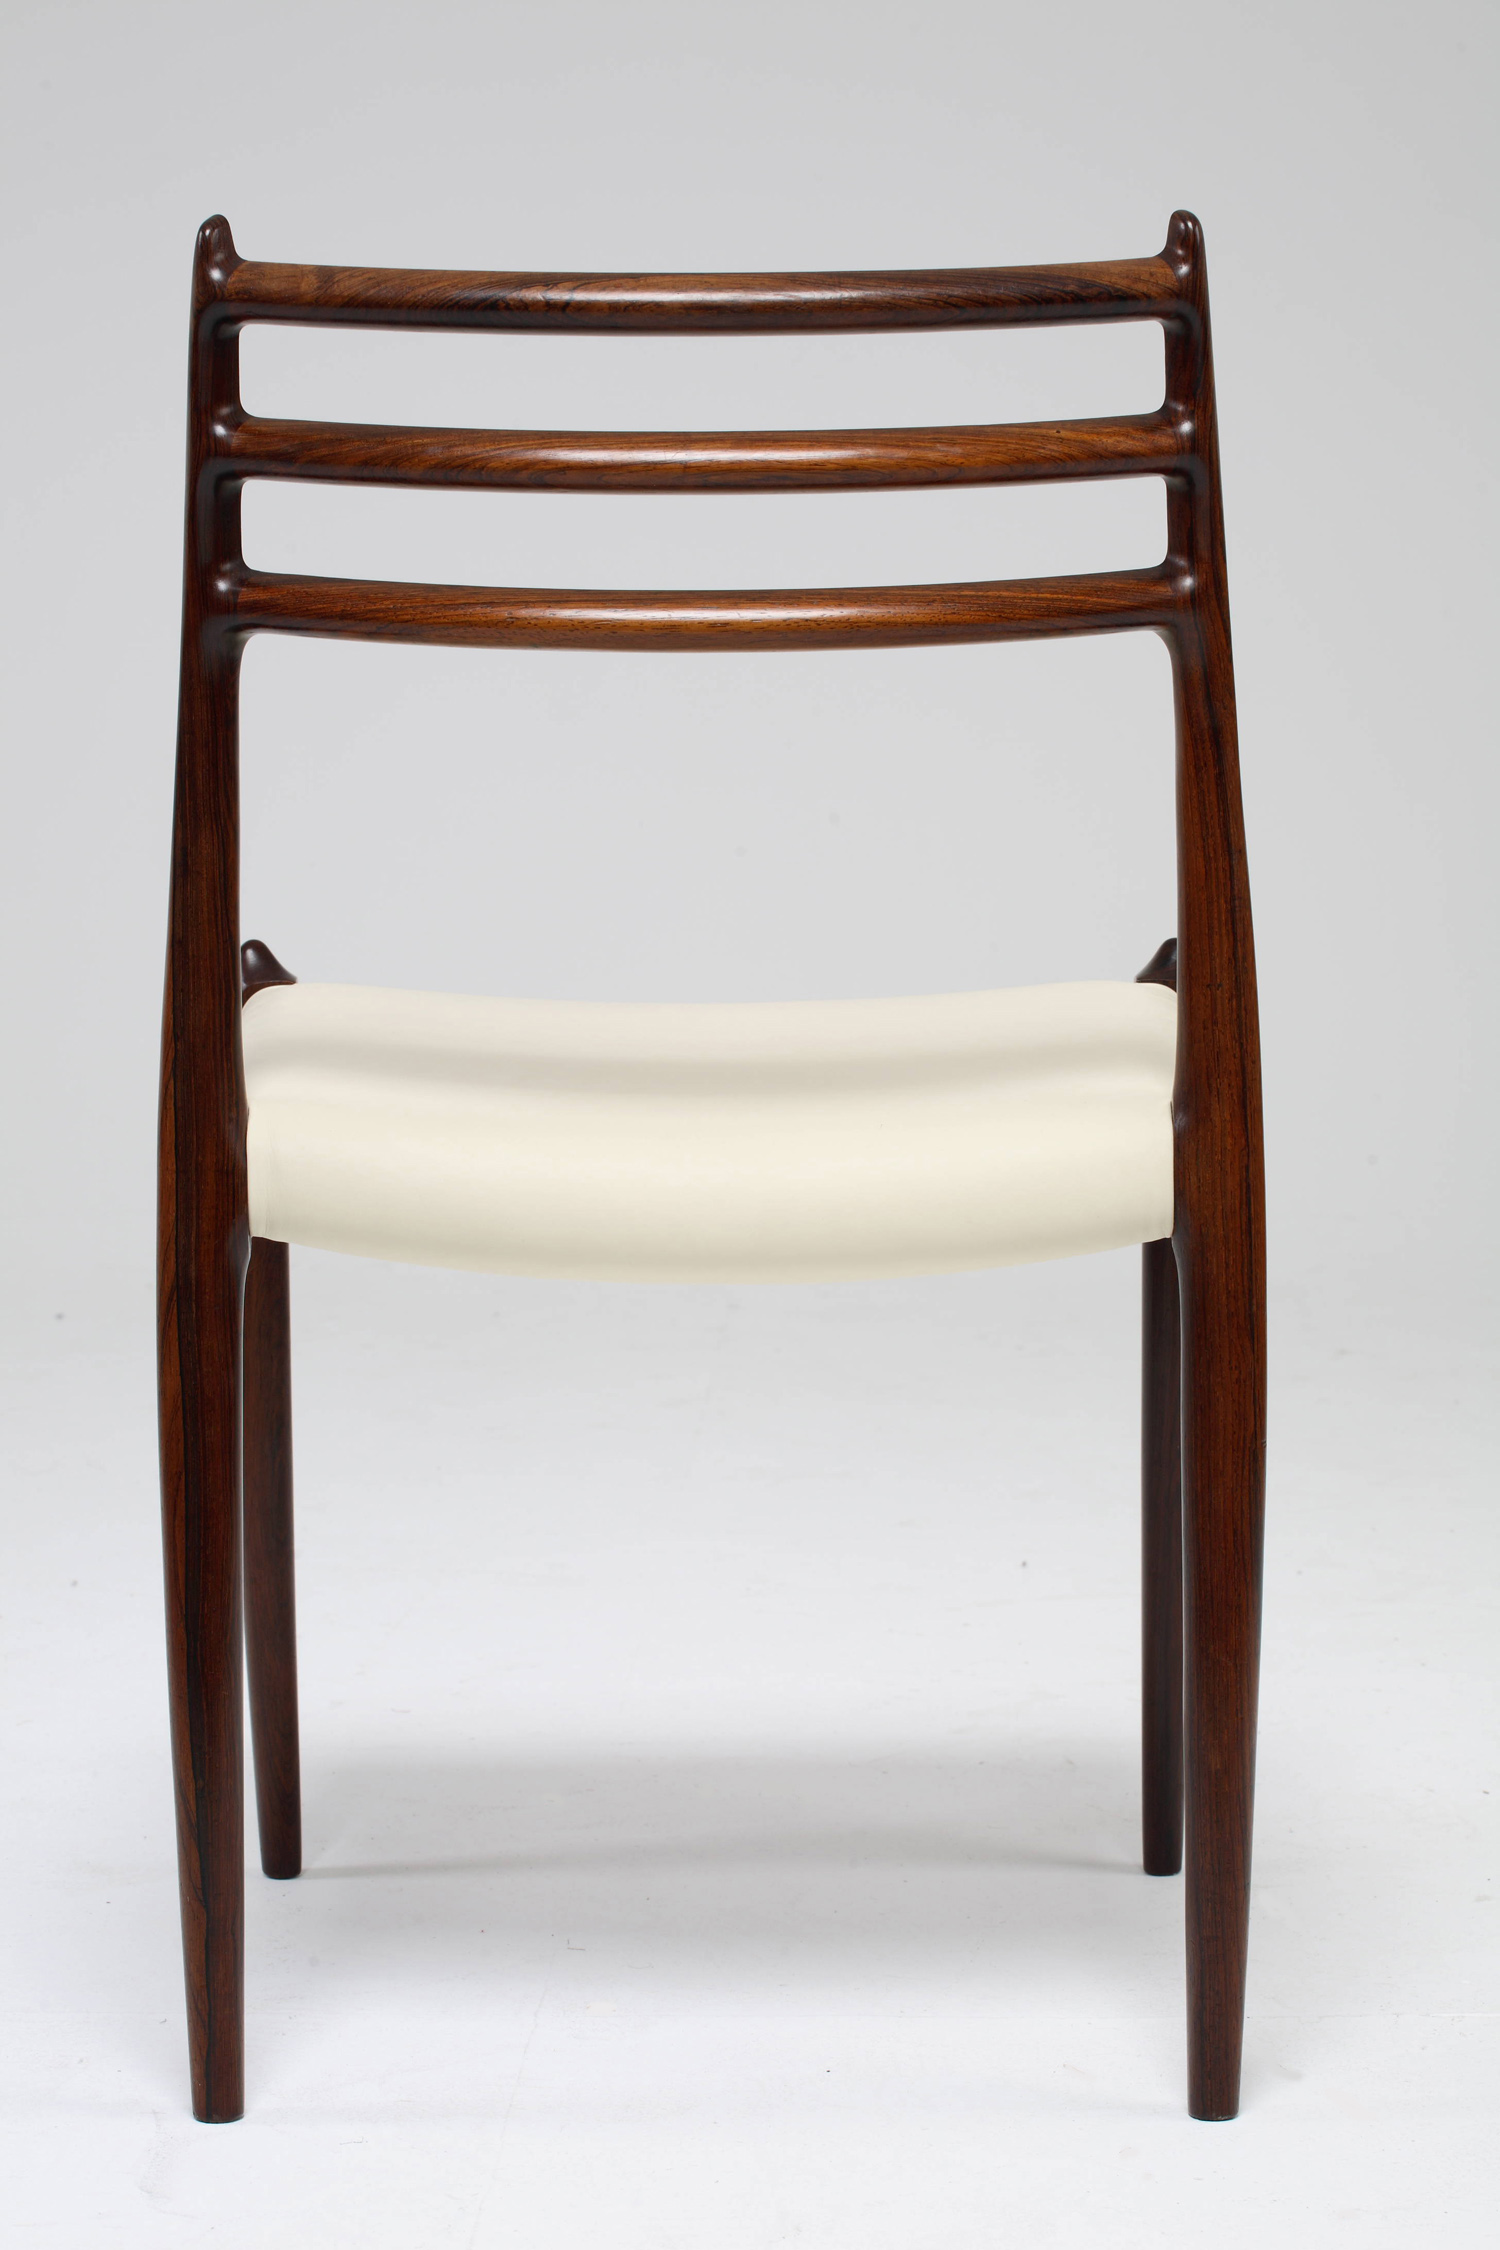 Chair_3_004_resize.jpg